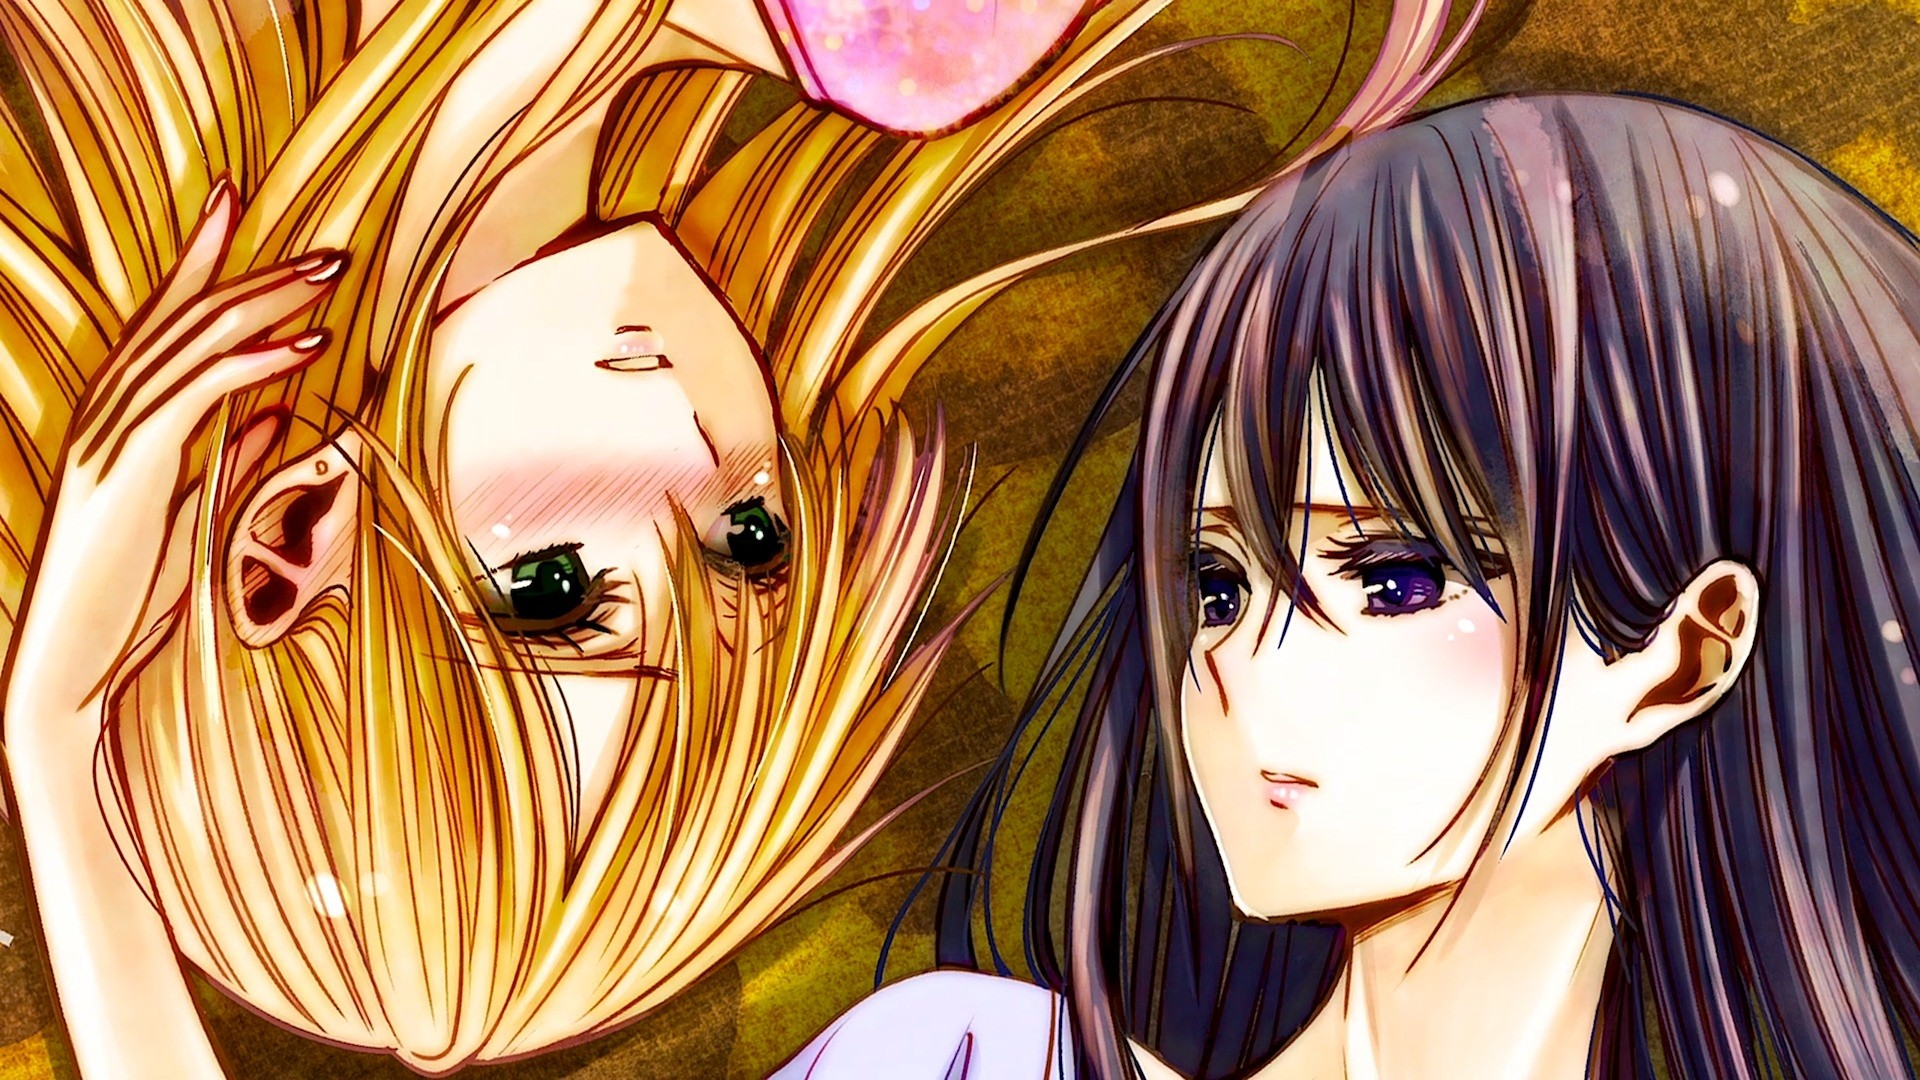 Citrus Anime Picture